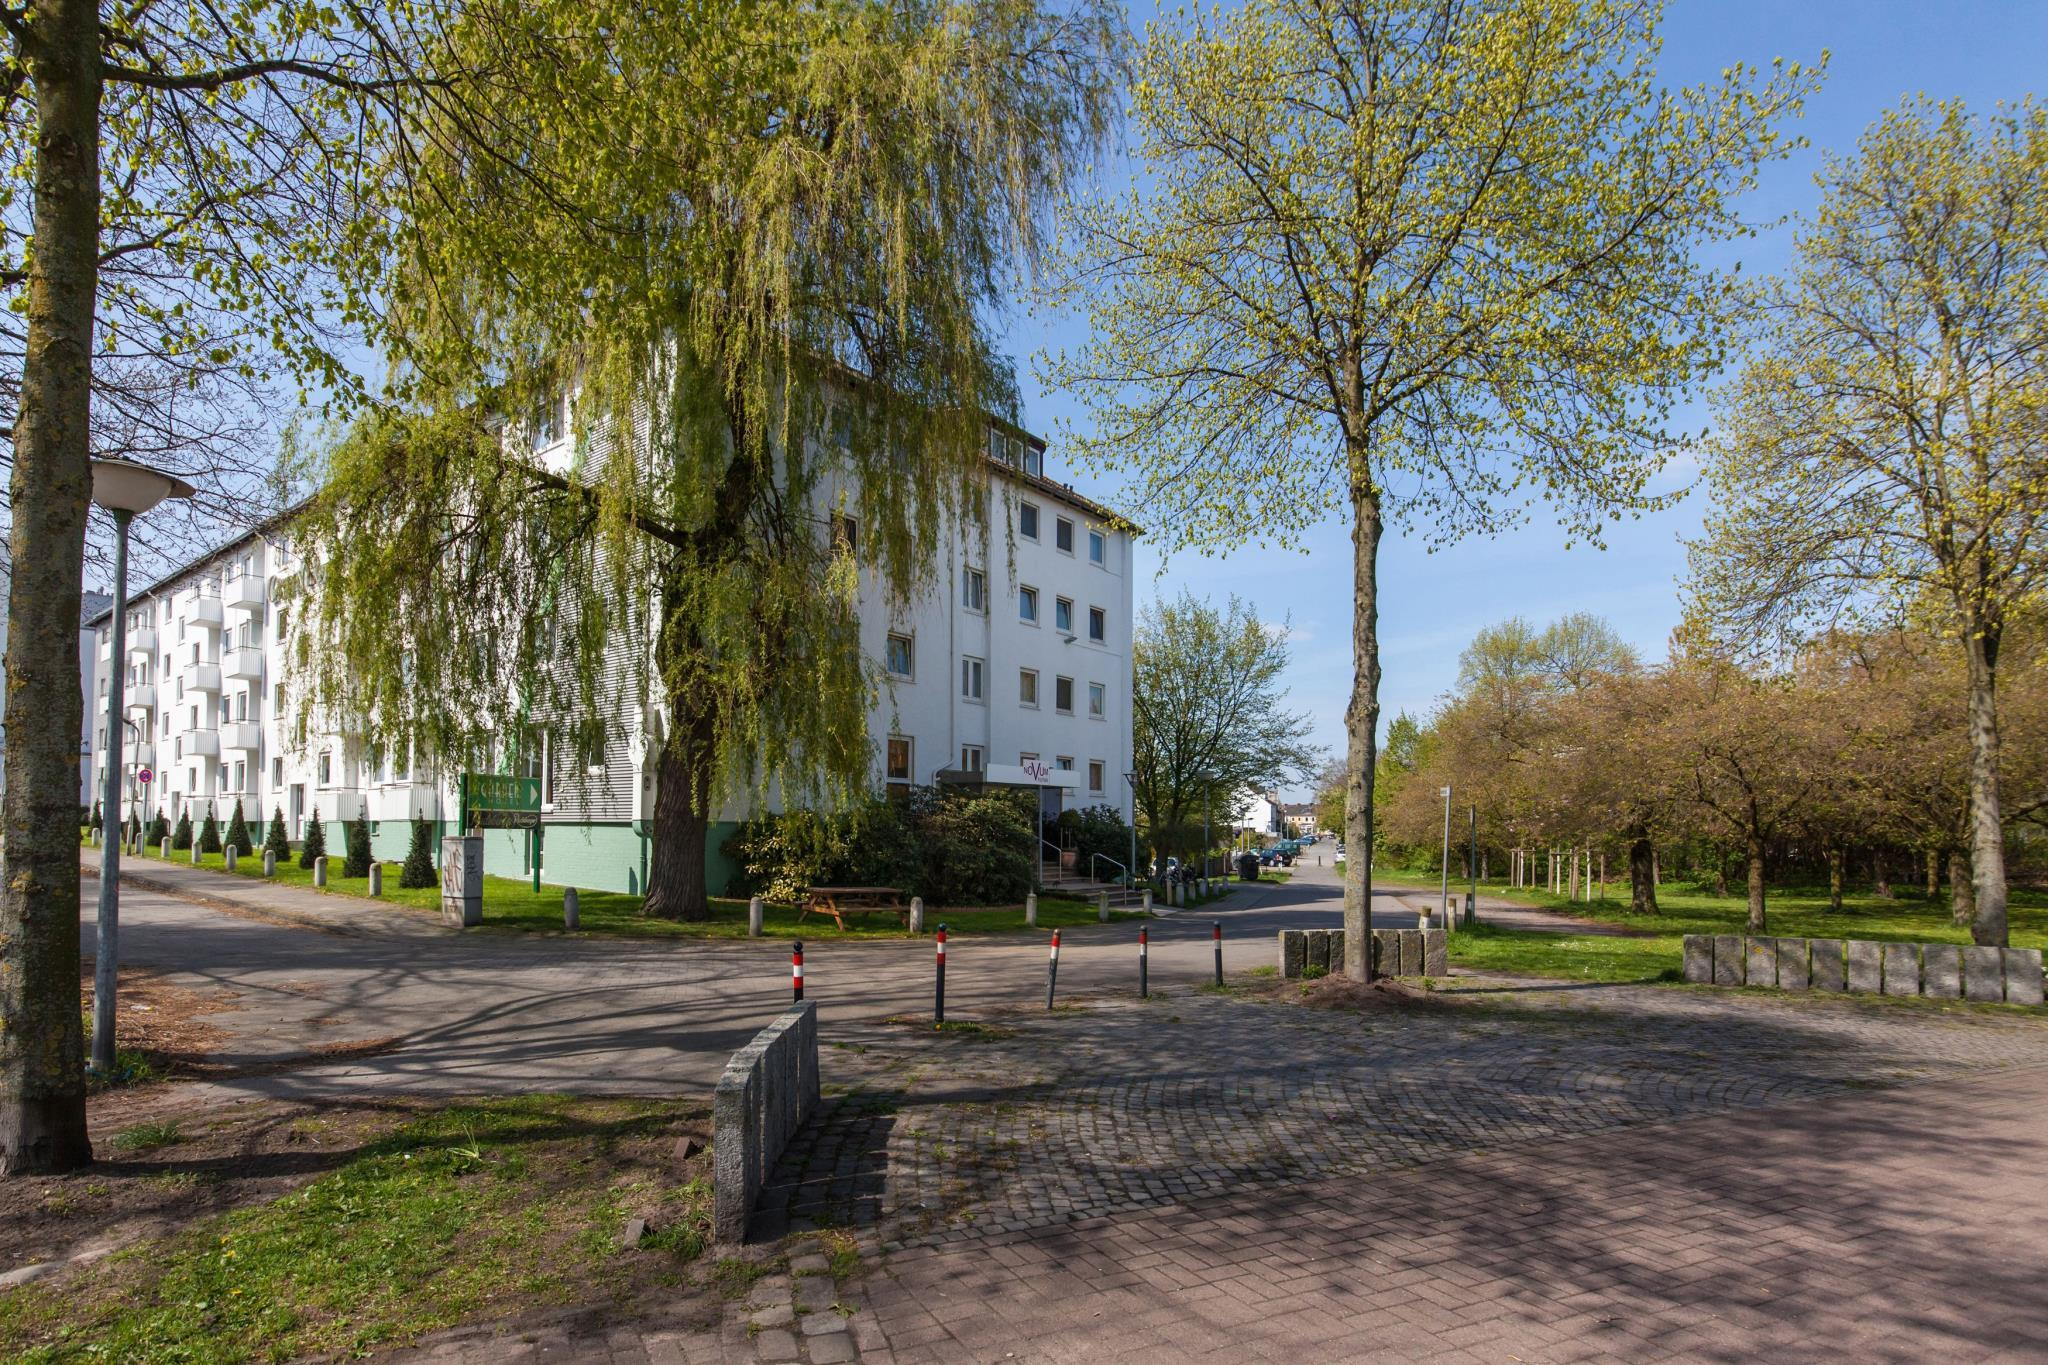 Novum Garden Hotel Bremen